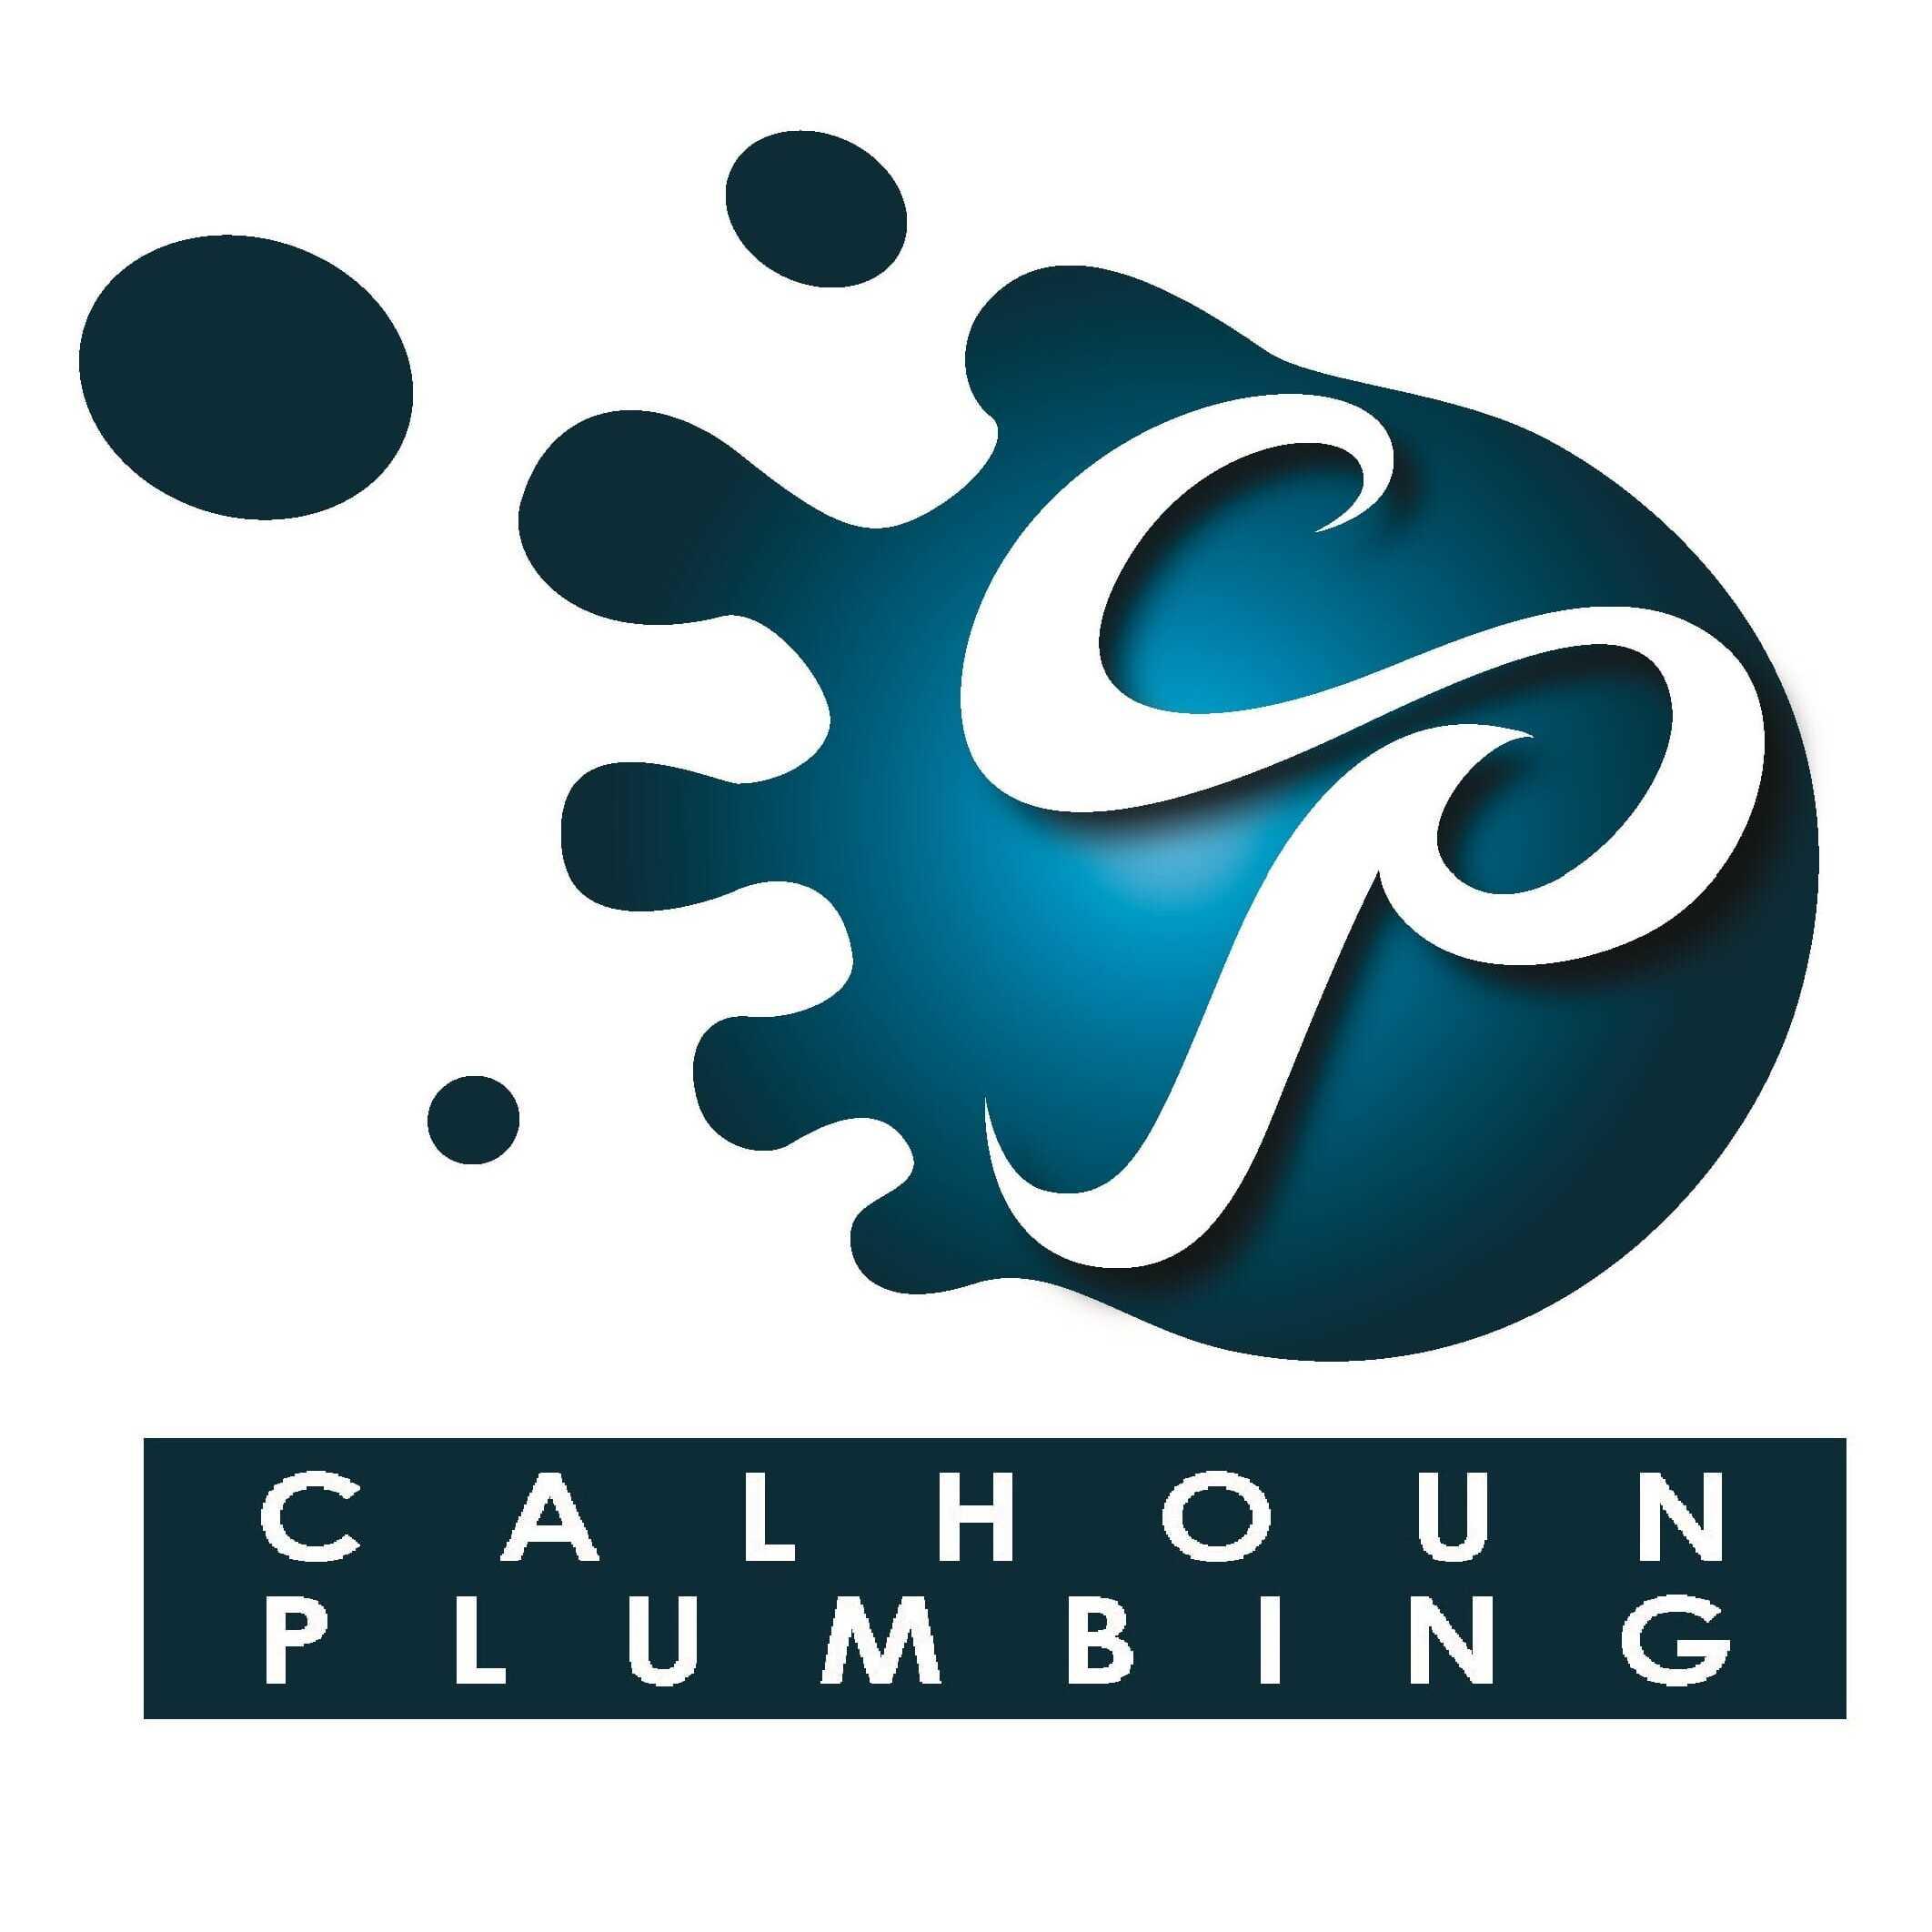 Calhoun Plumbing